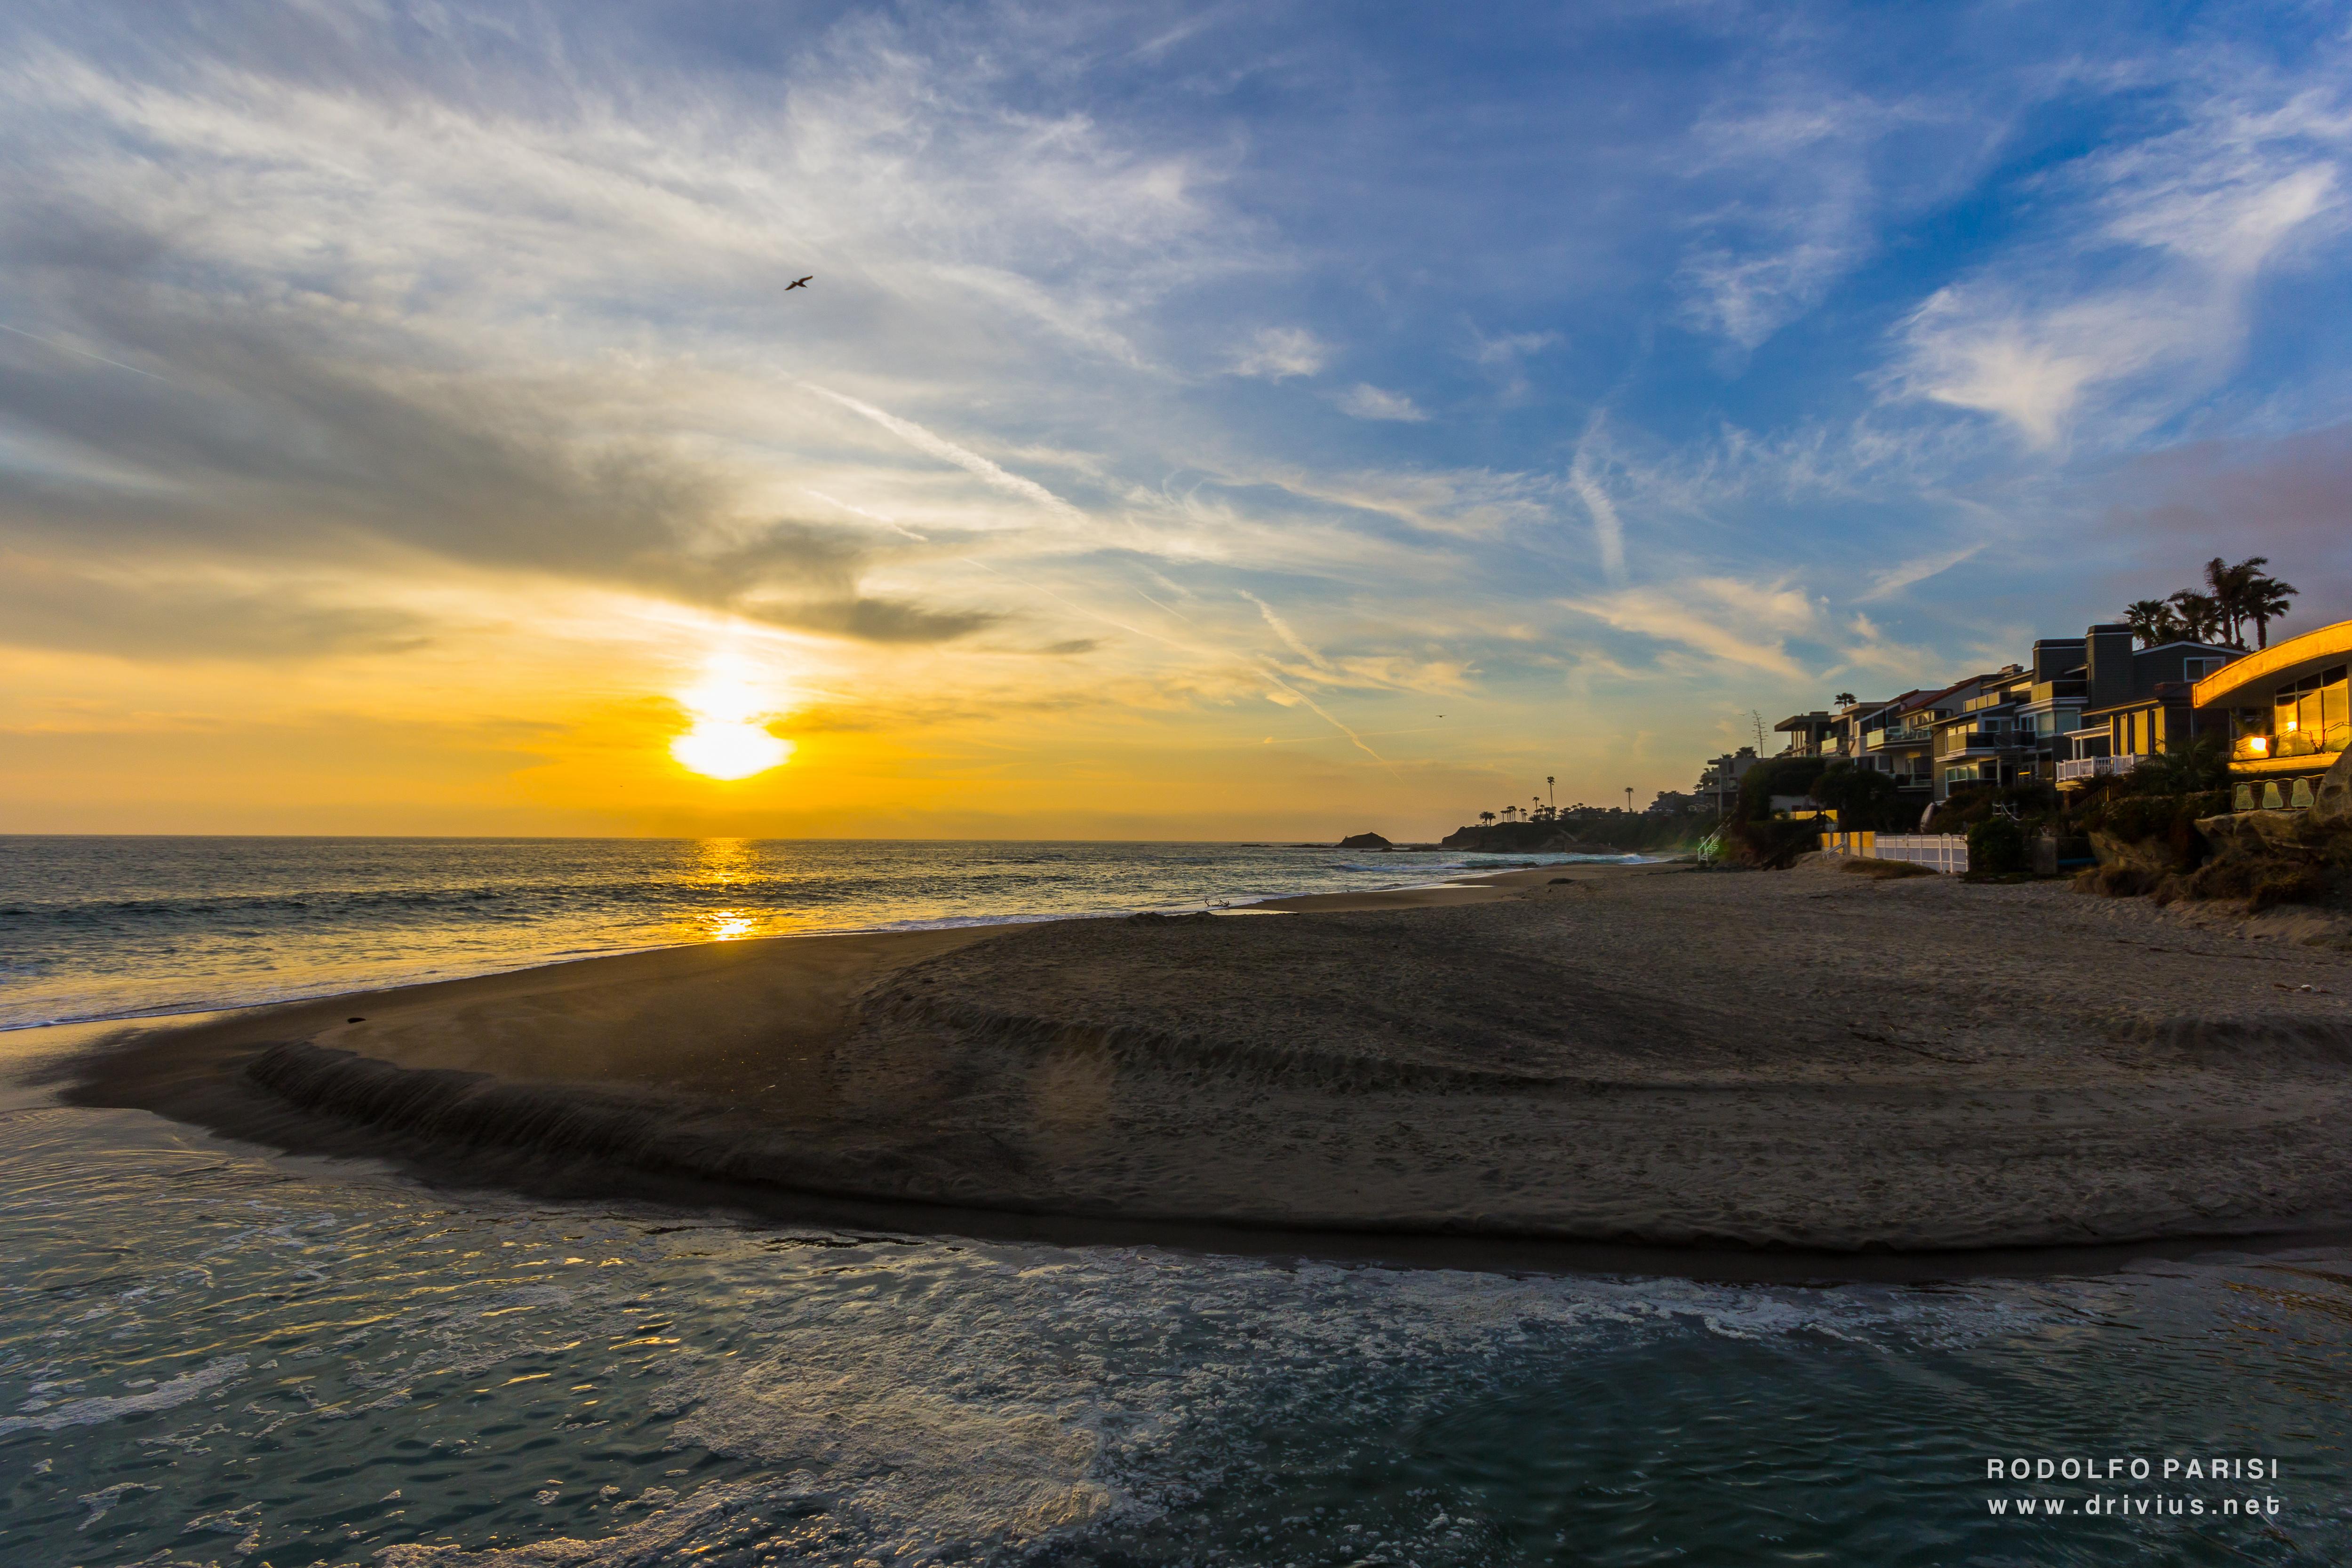 Aliso Beach, CA